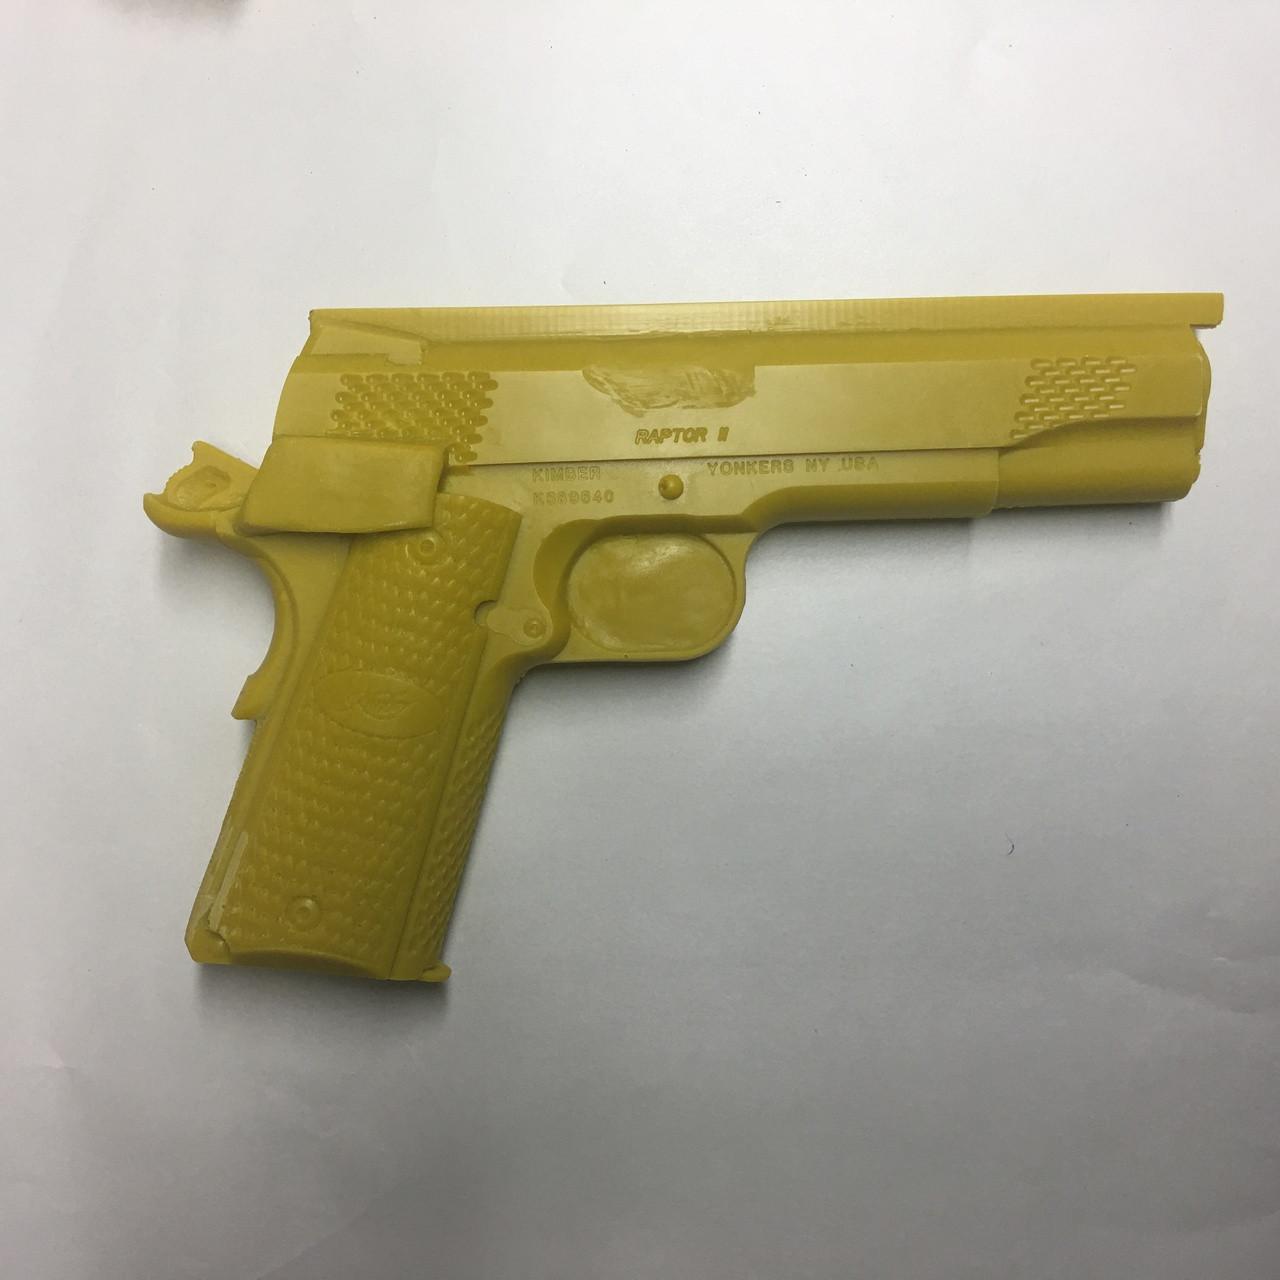 Prepped Kimber Custom II 5